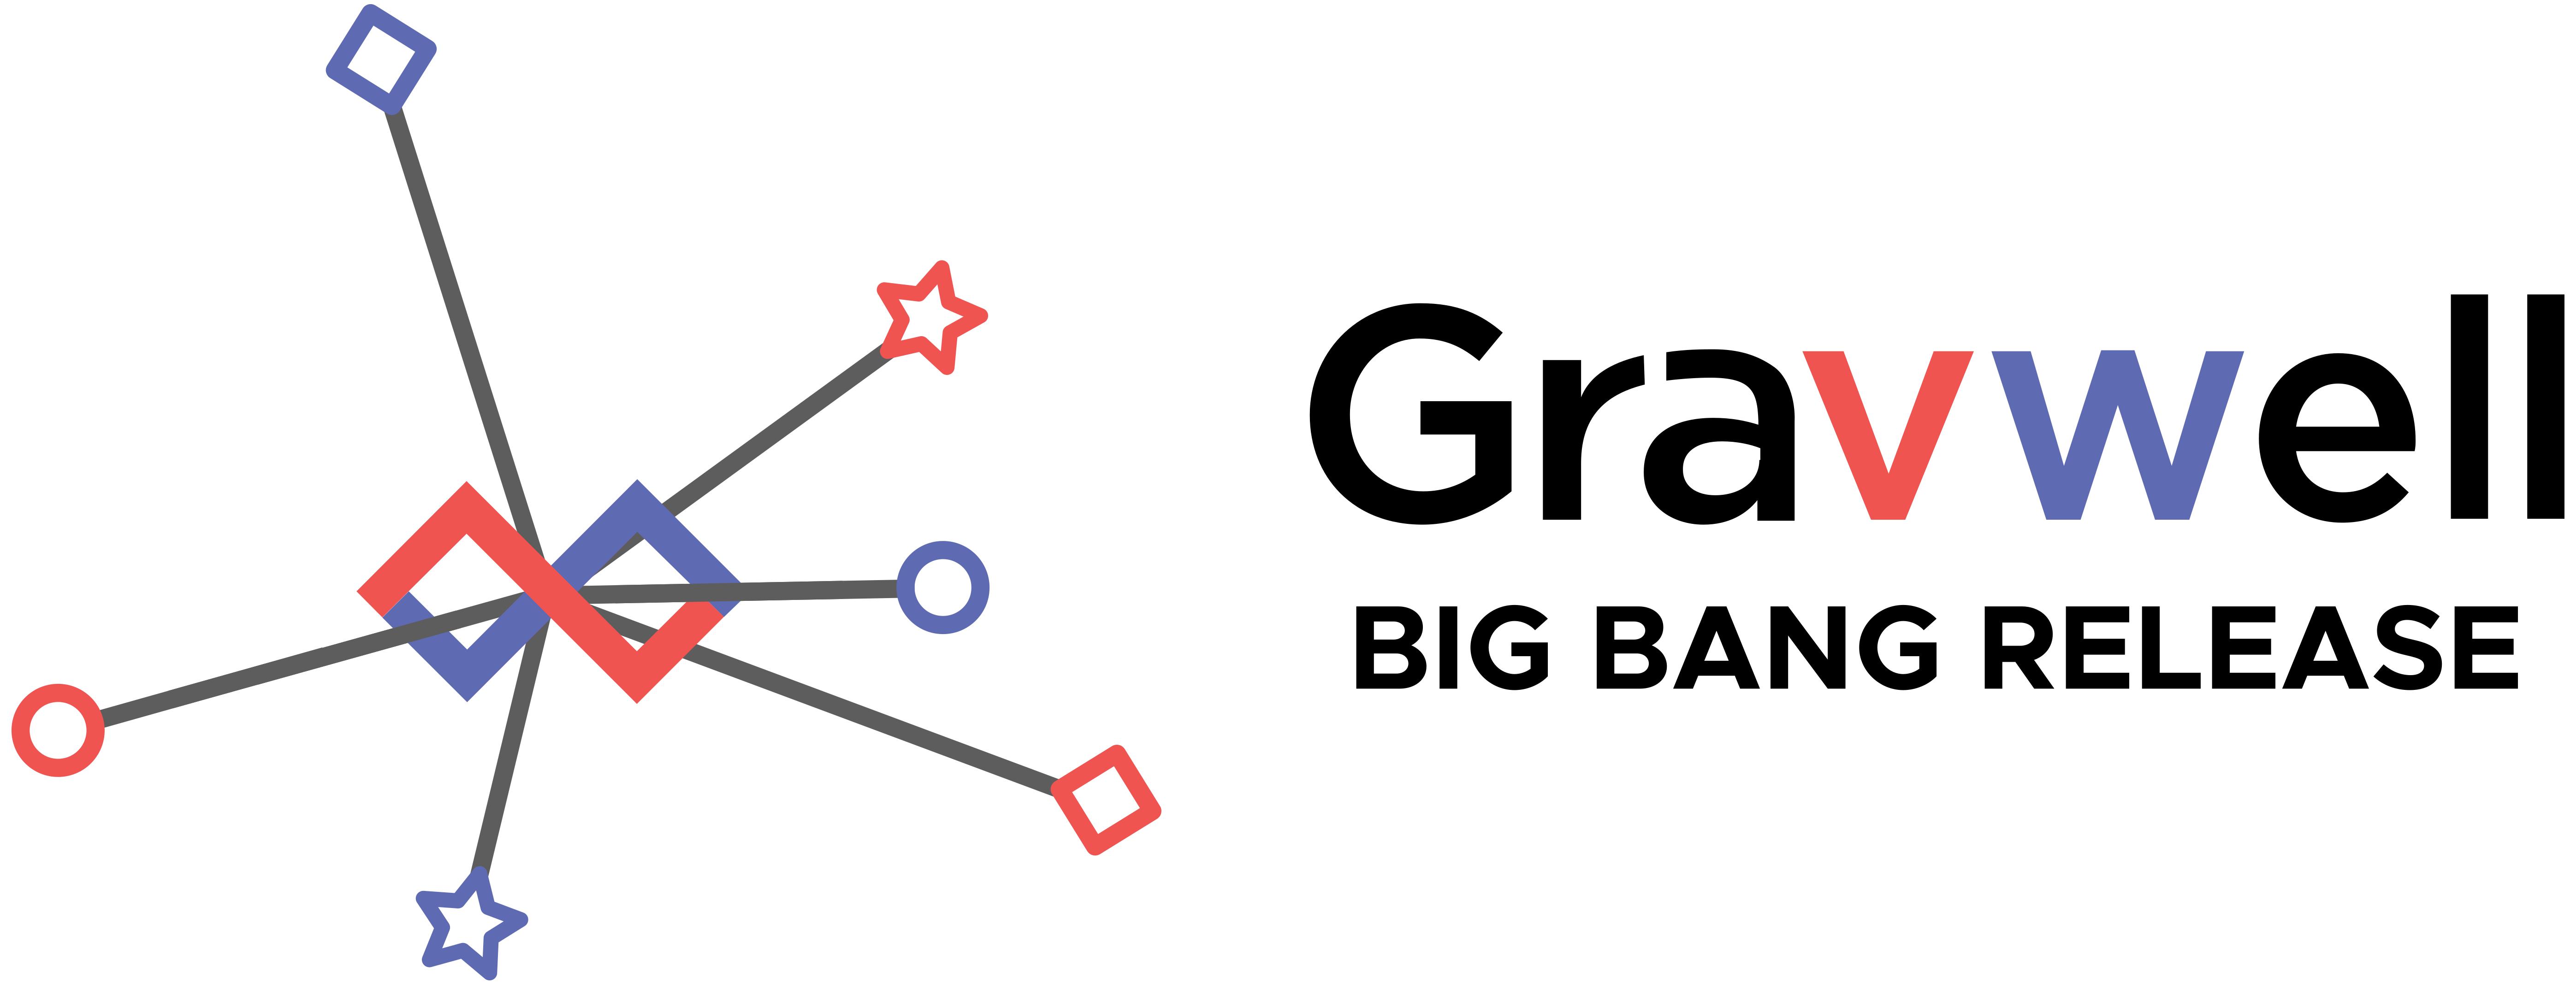 gravwell_big_bang_release_draft1_white_horizontal